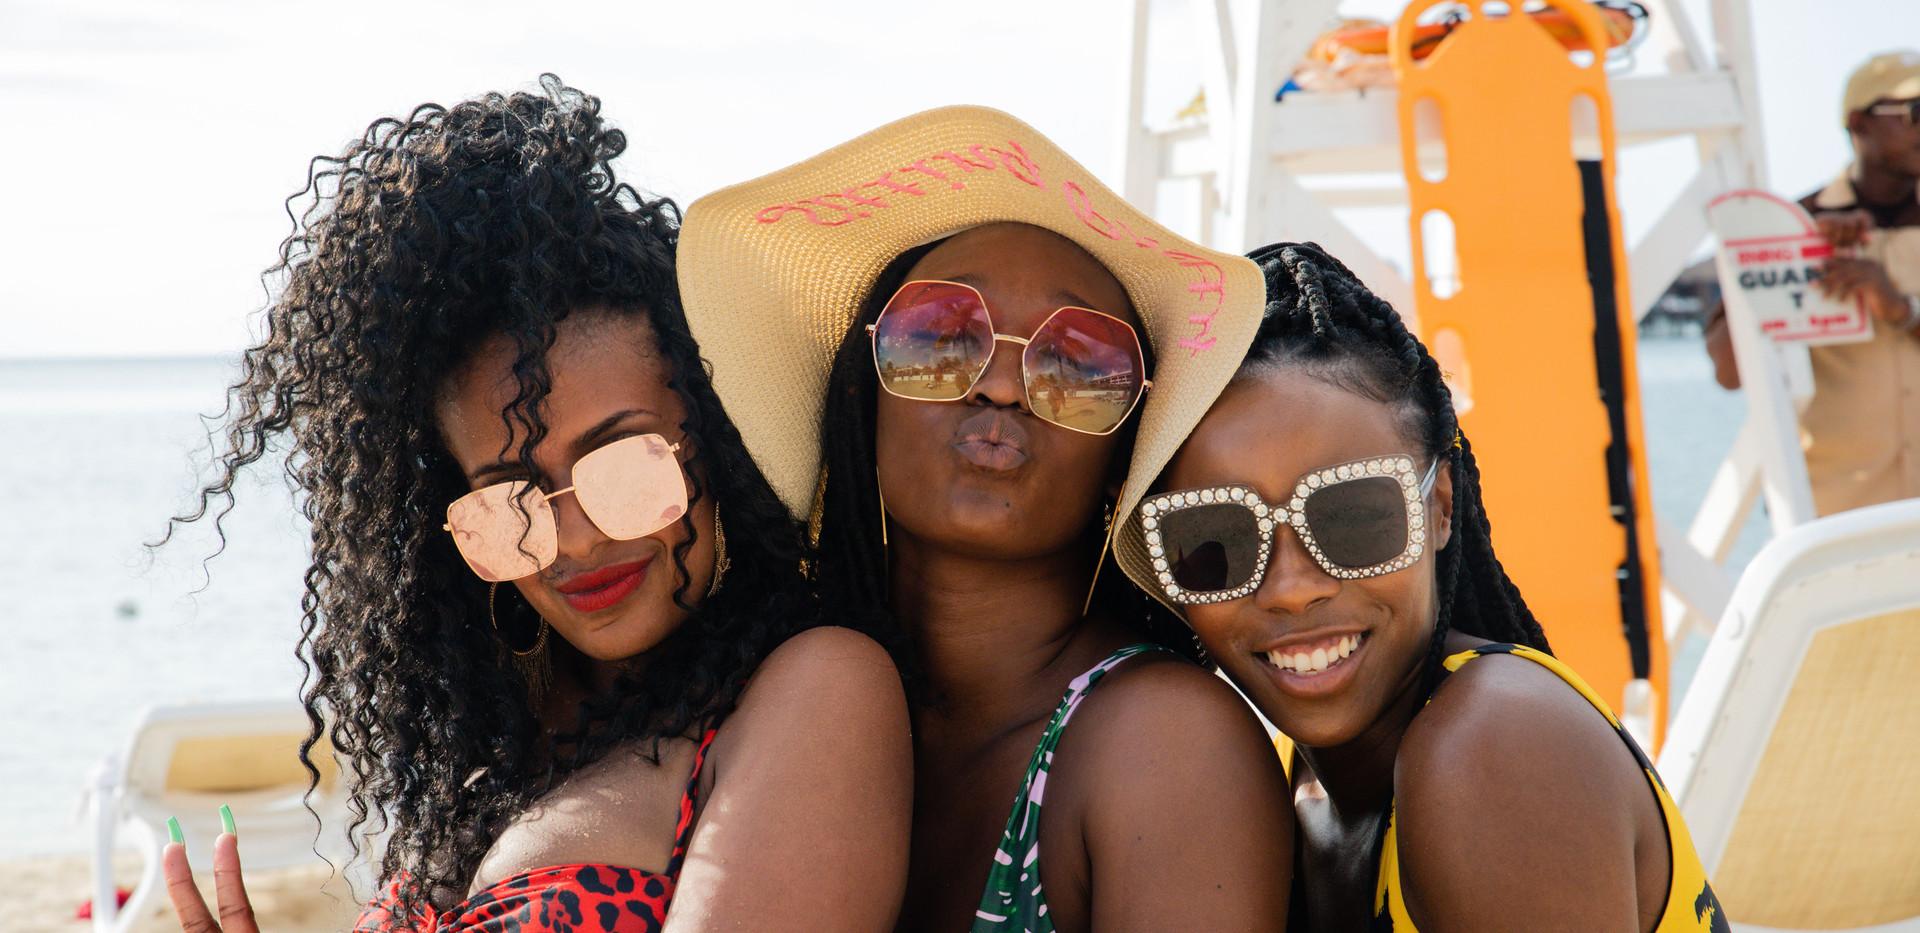 beachfest 3.jpg